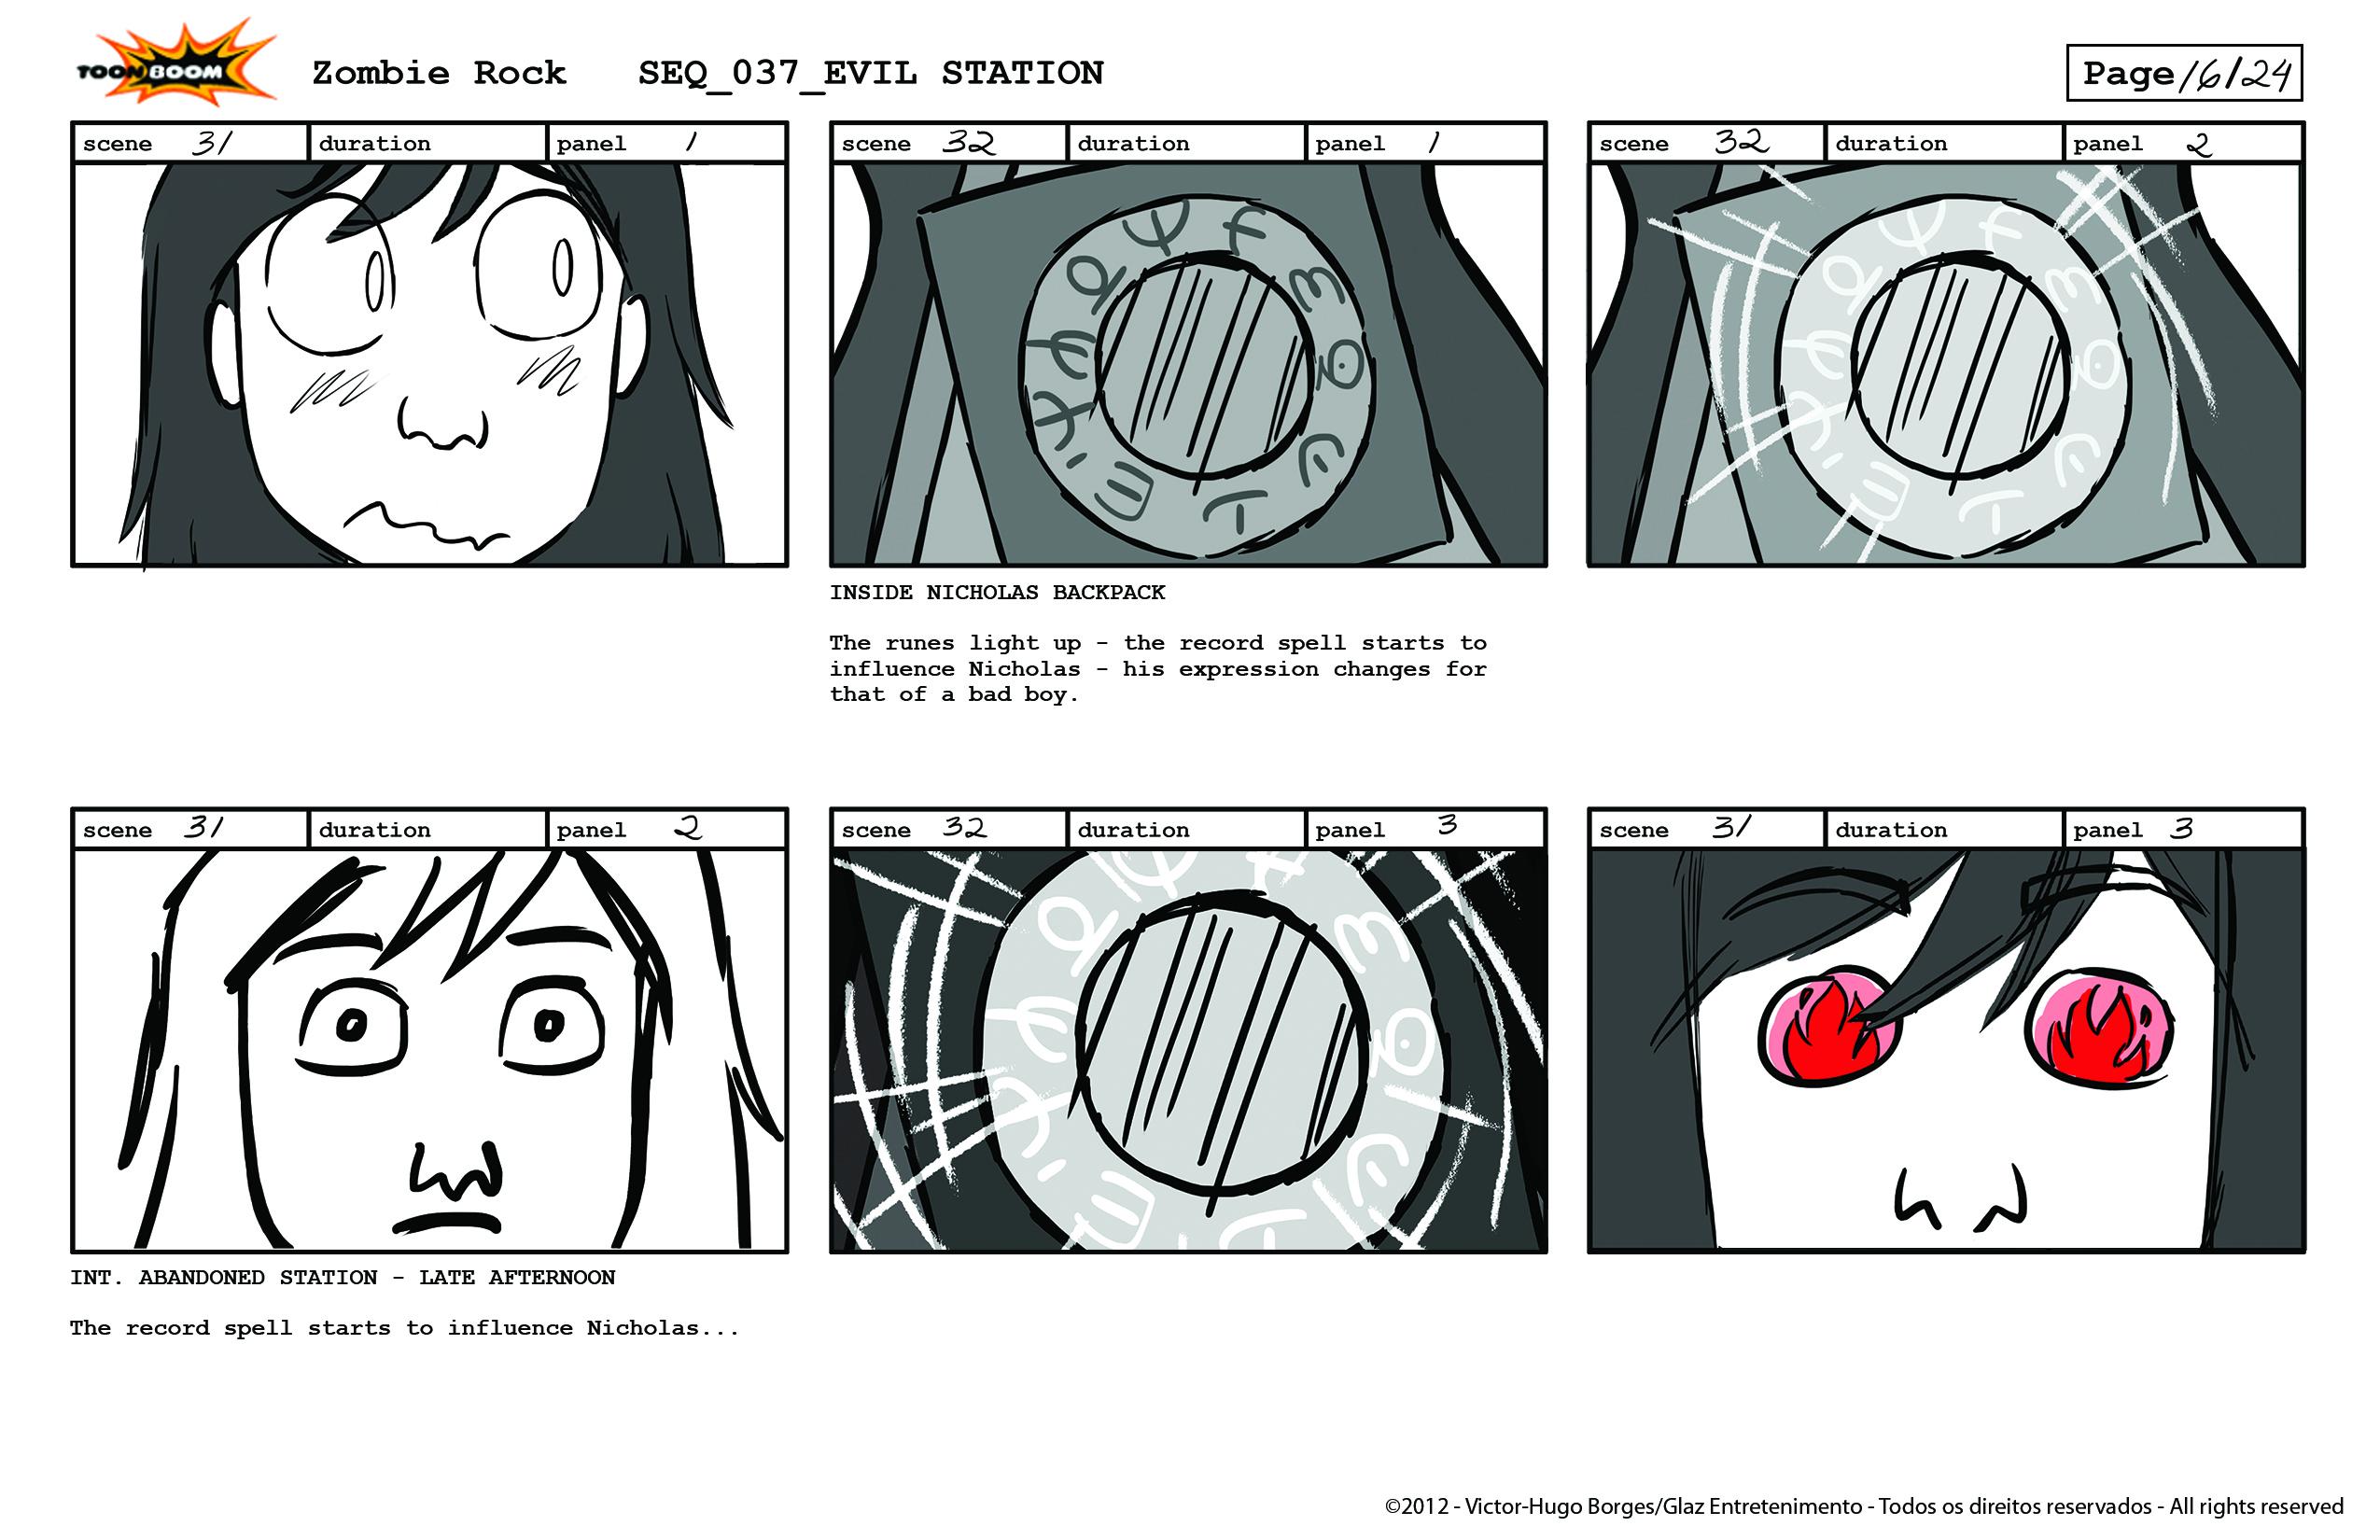 SEQ037_Evil Station_page16